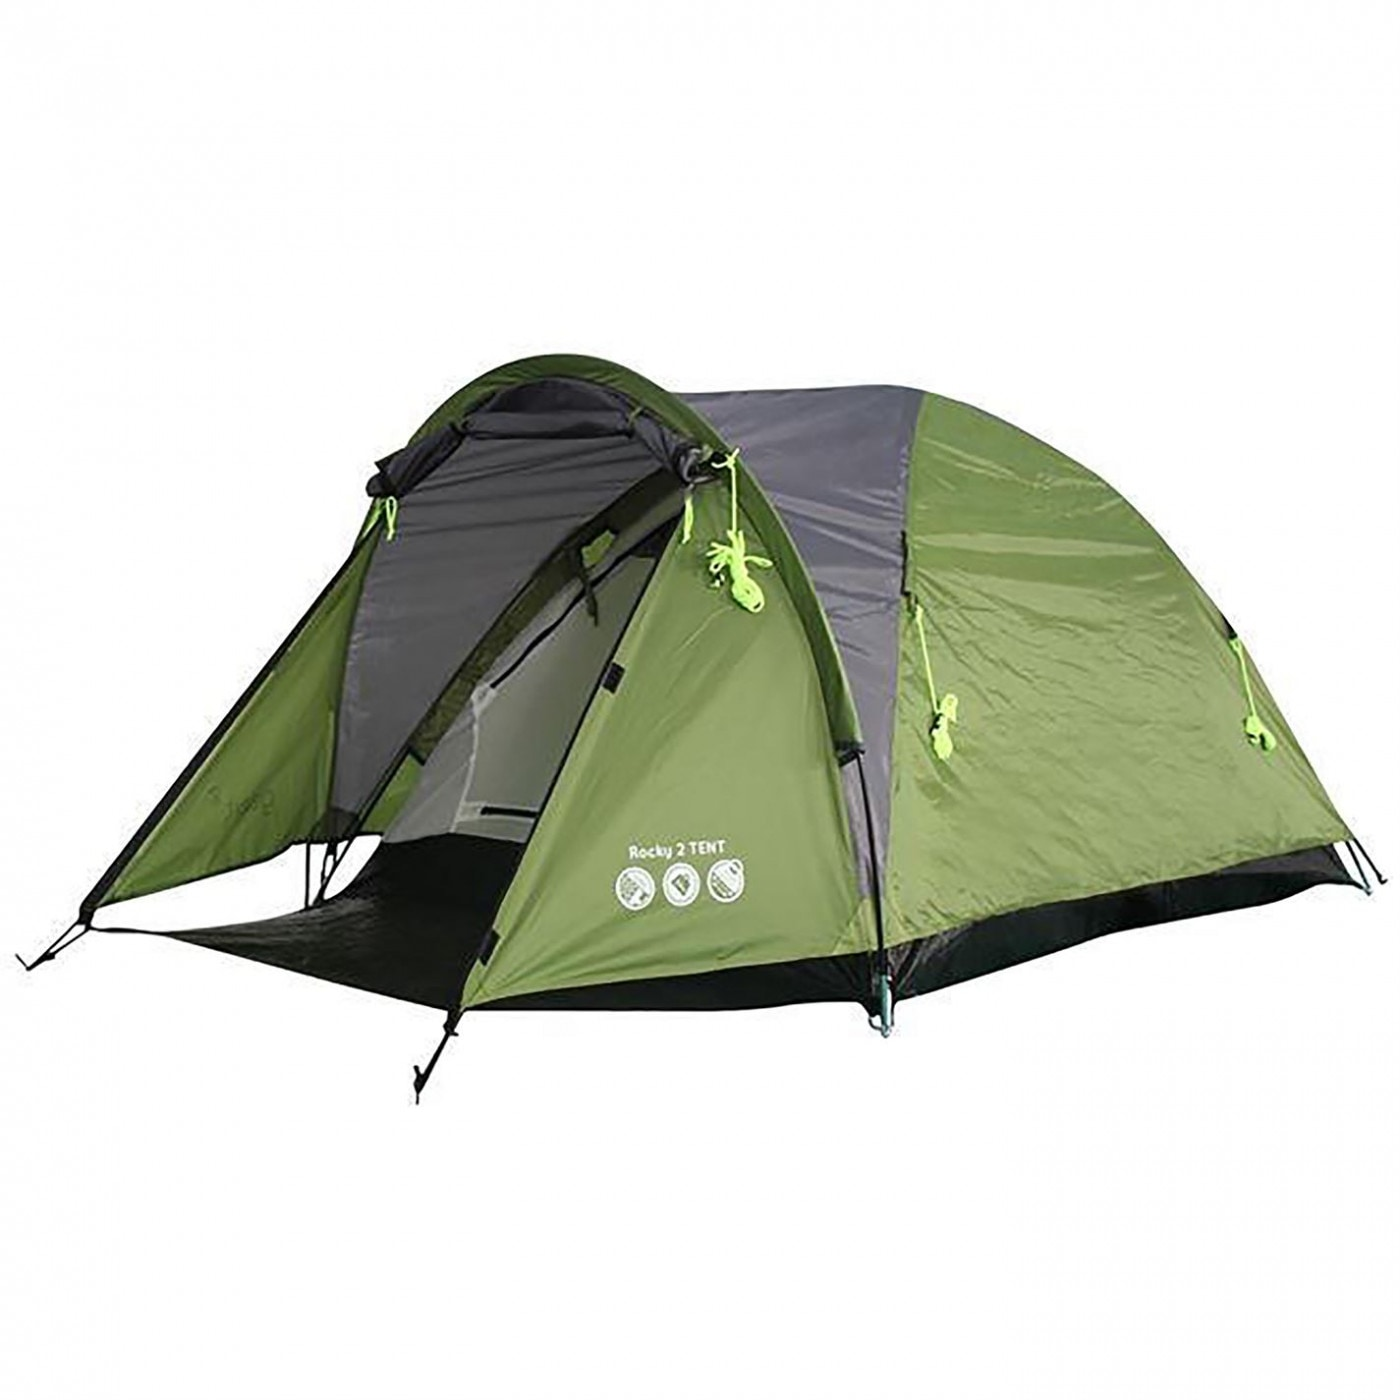 Gelert Rocky 2 Tent